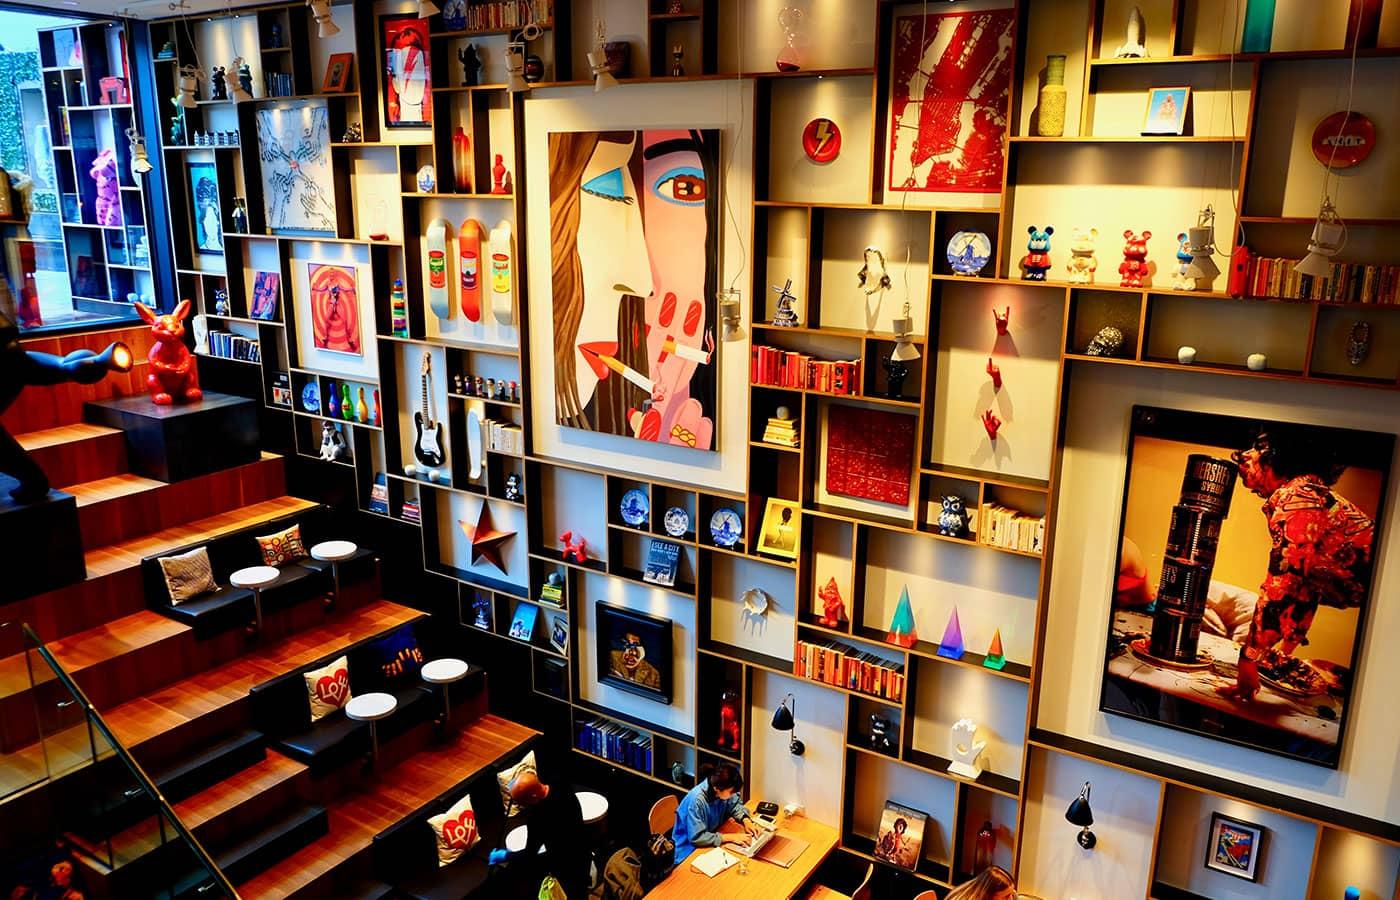 citizenM New York Bowery Hotel - Konst